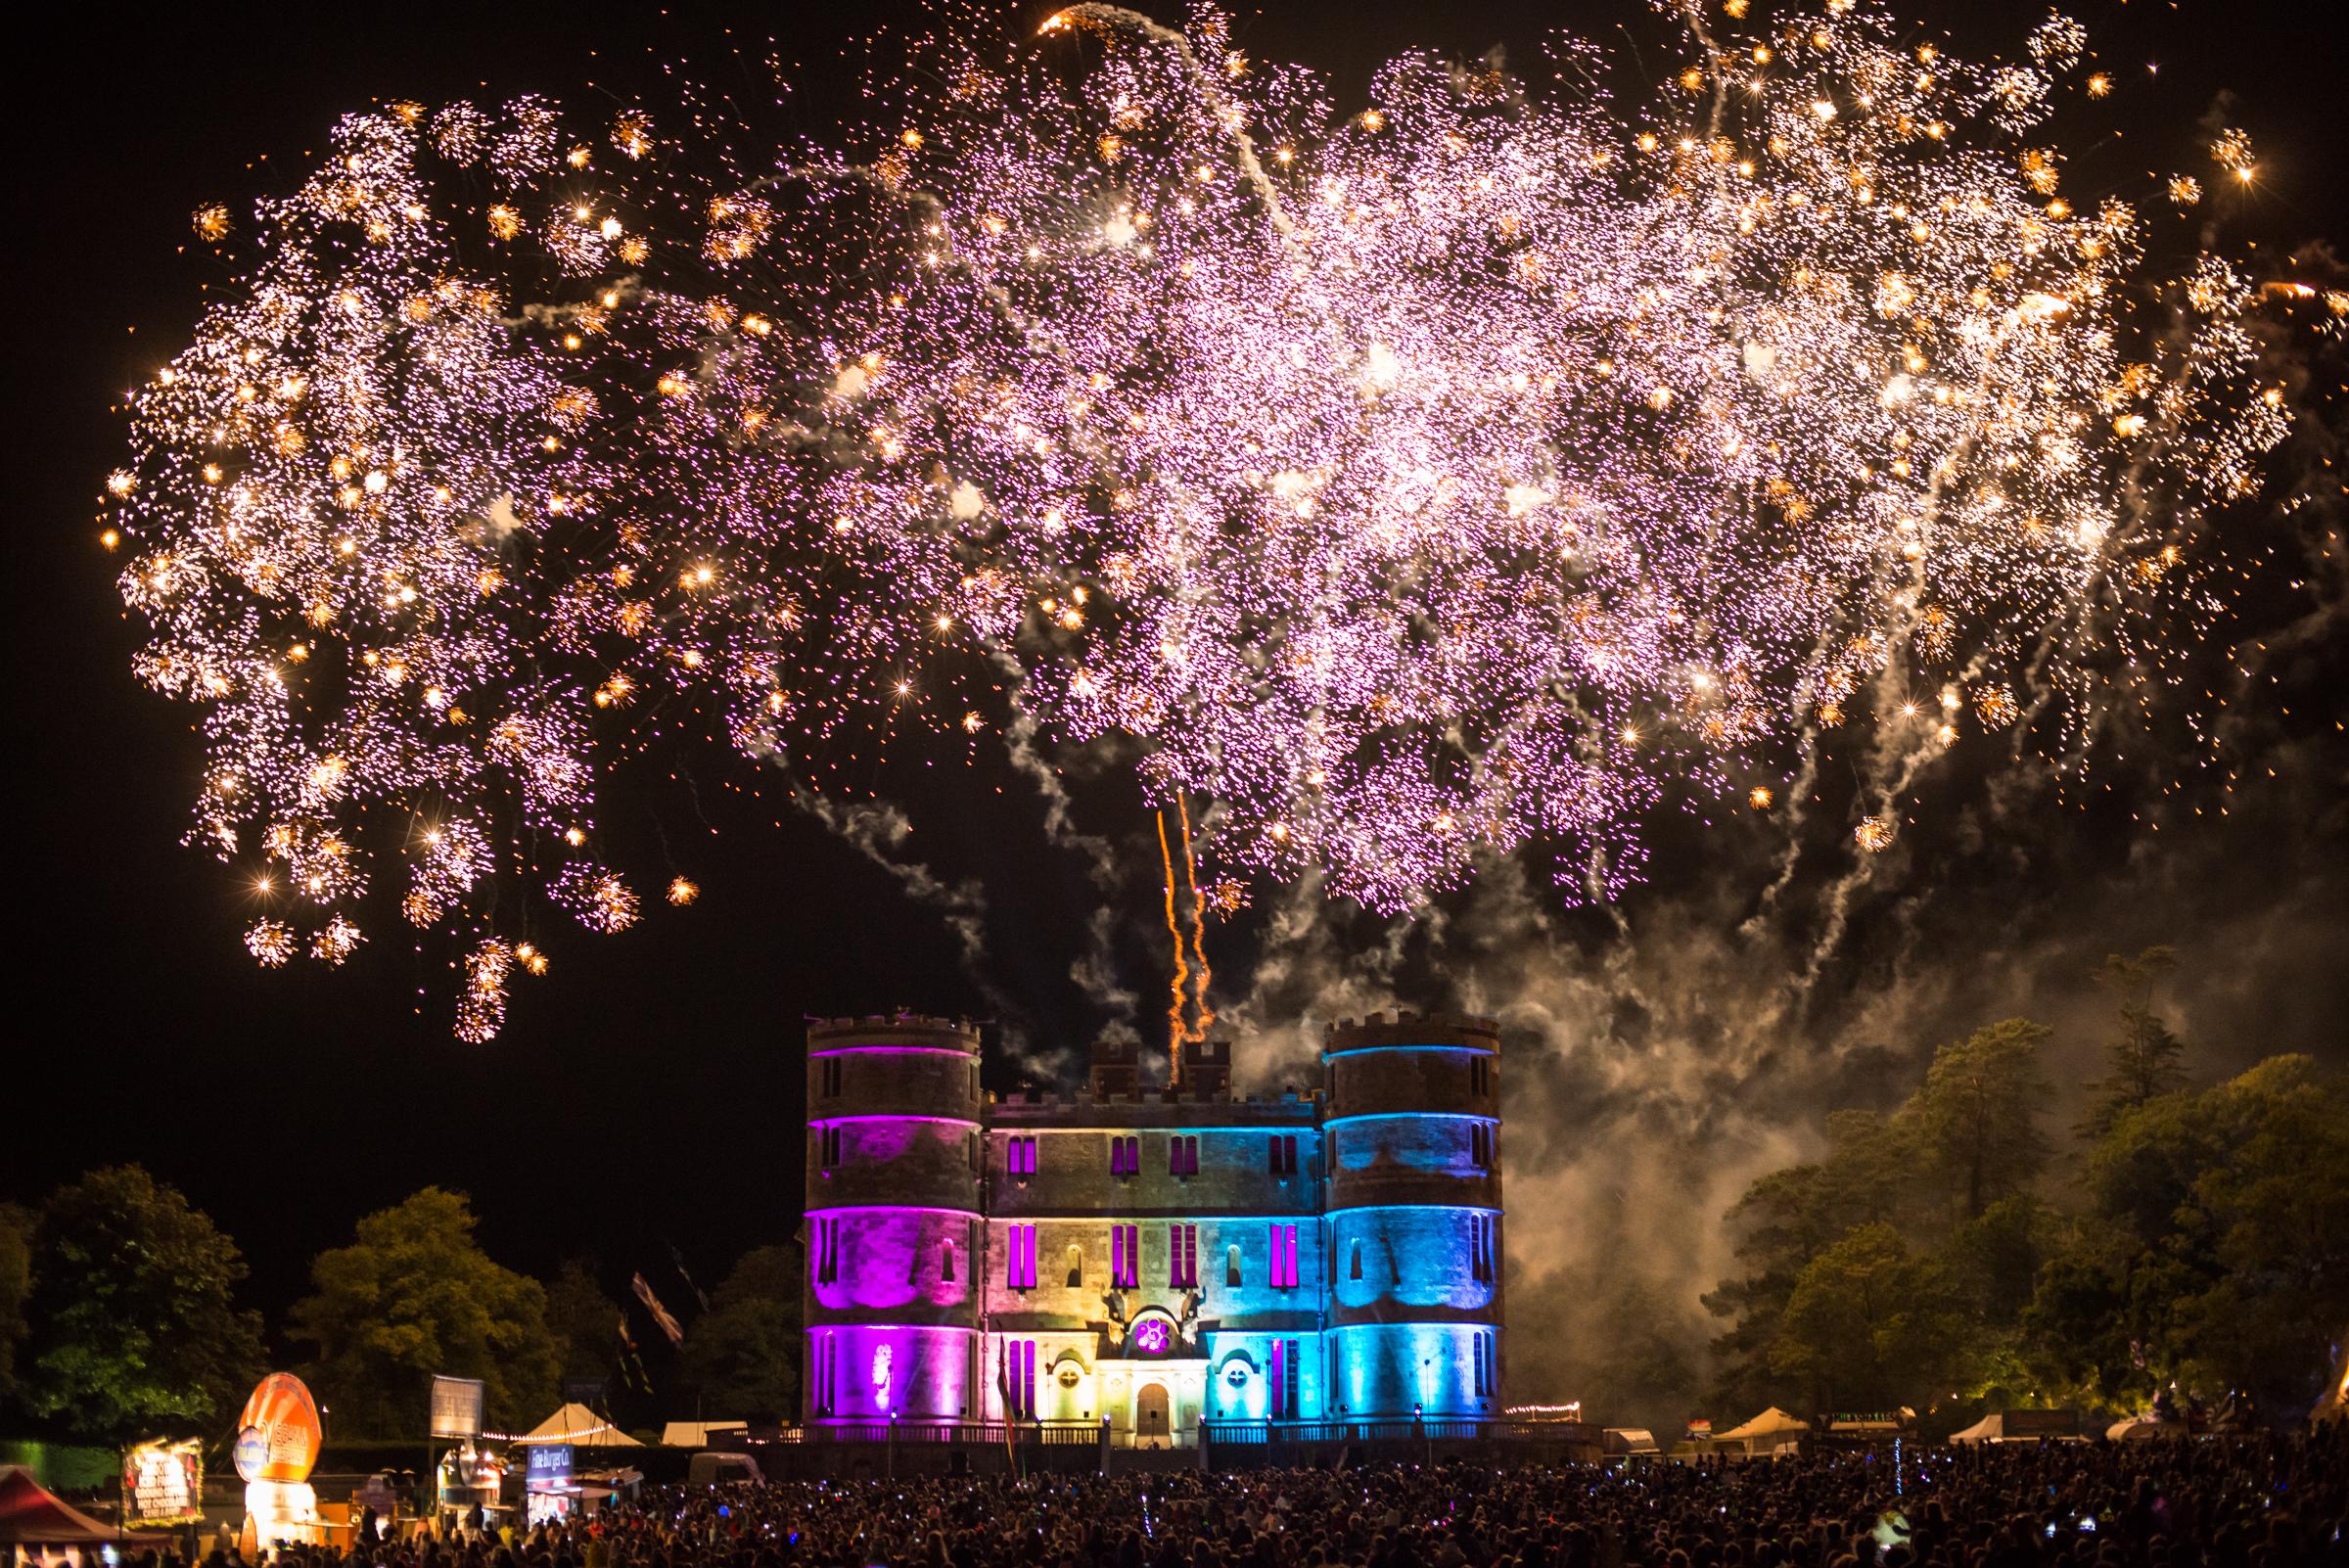 Camp Bestival 2019 Fireworks